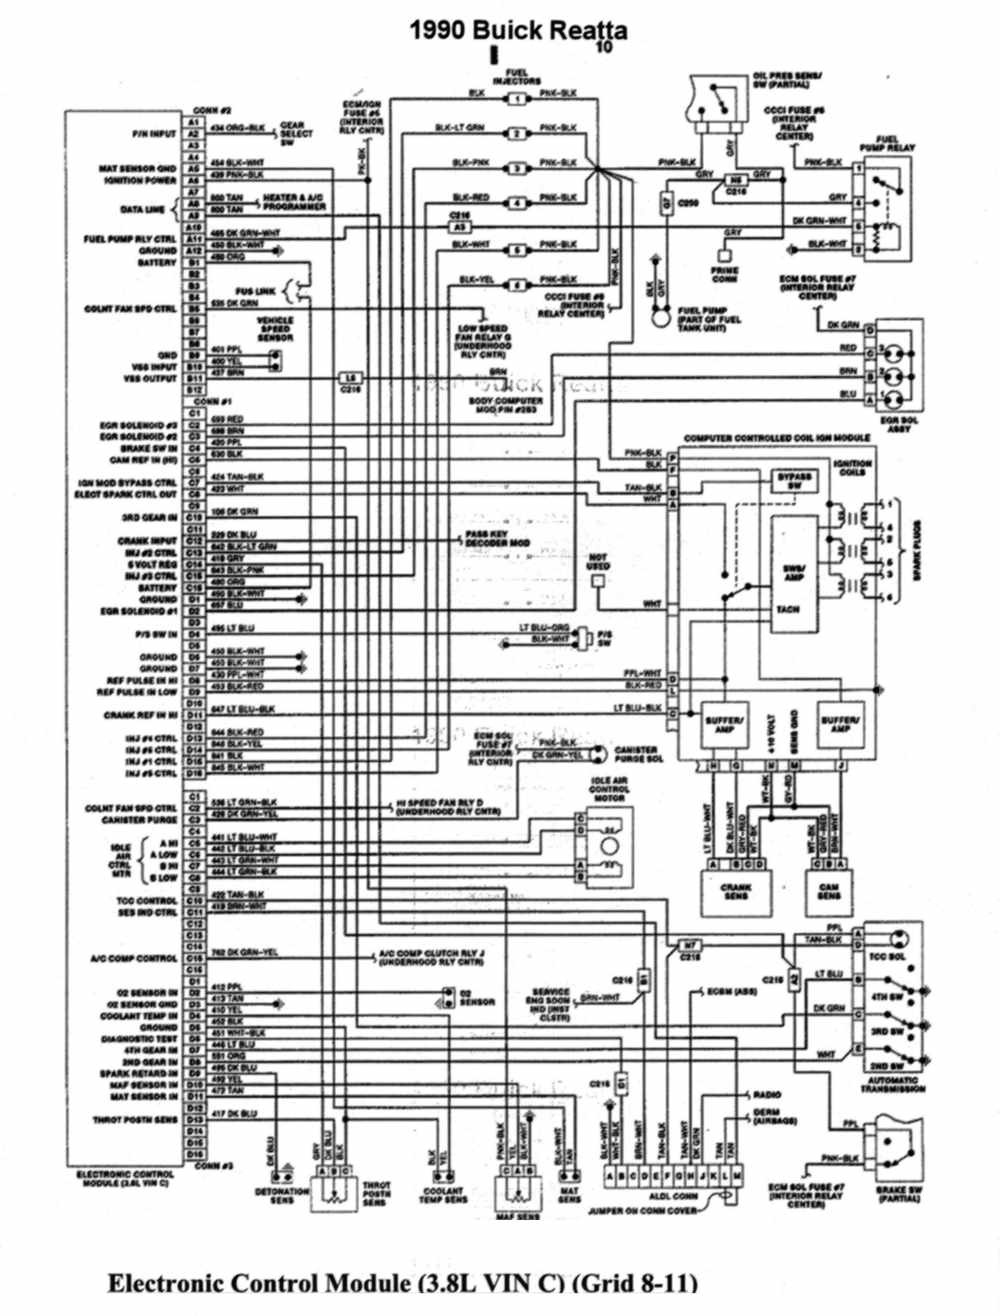 1990 buick riviera wiring diagram manual e books rh 6 made4dogs de